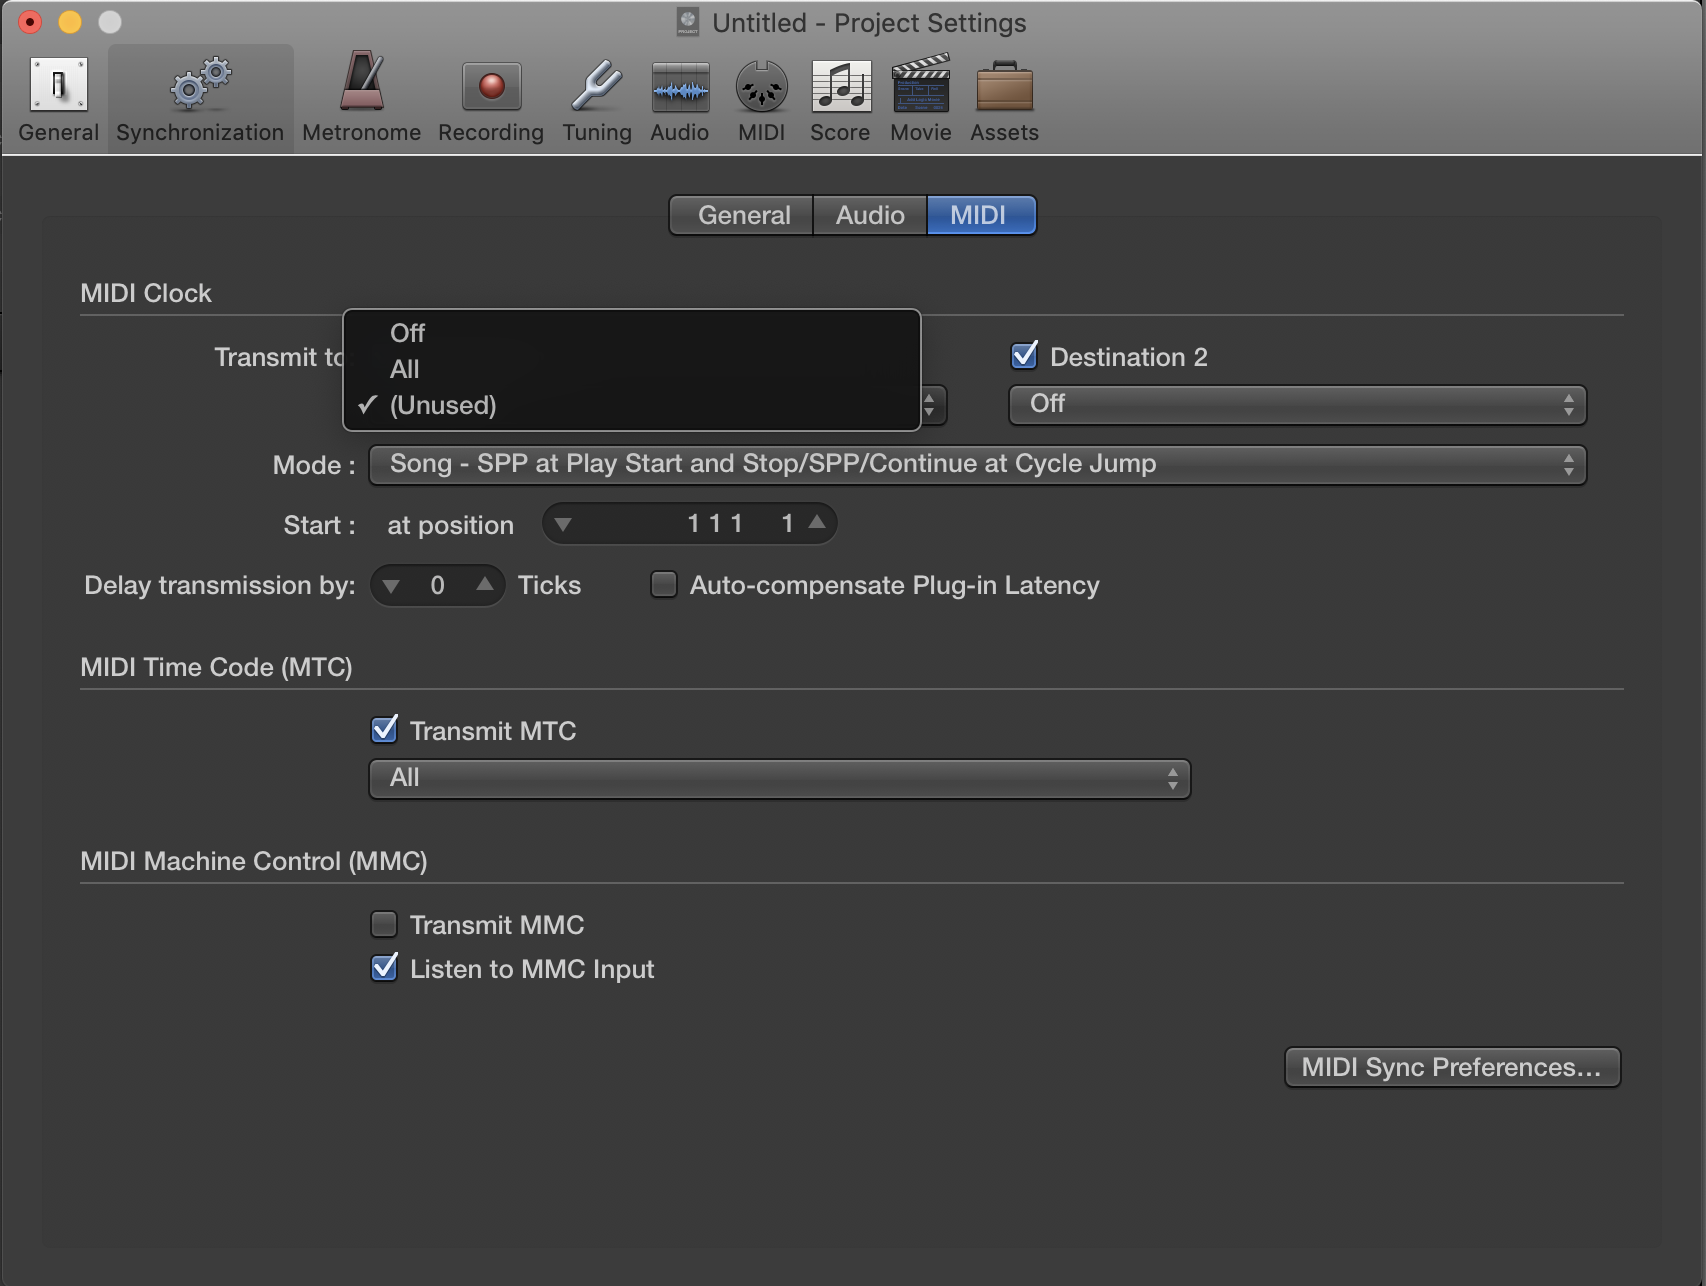 Akai MPK 249 not recognized in Logic - Apple Community